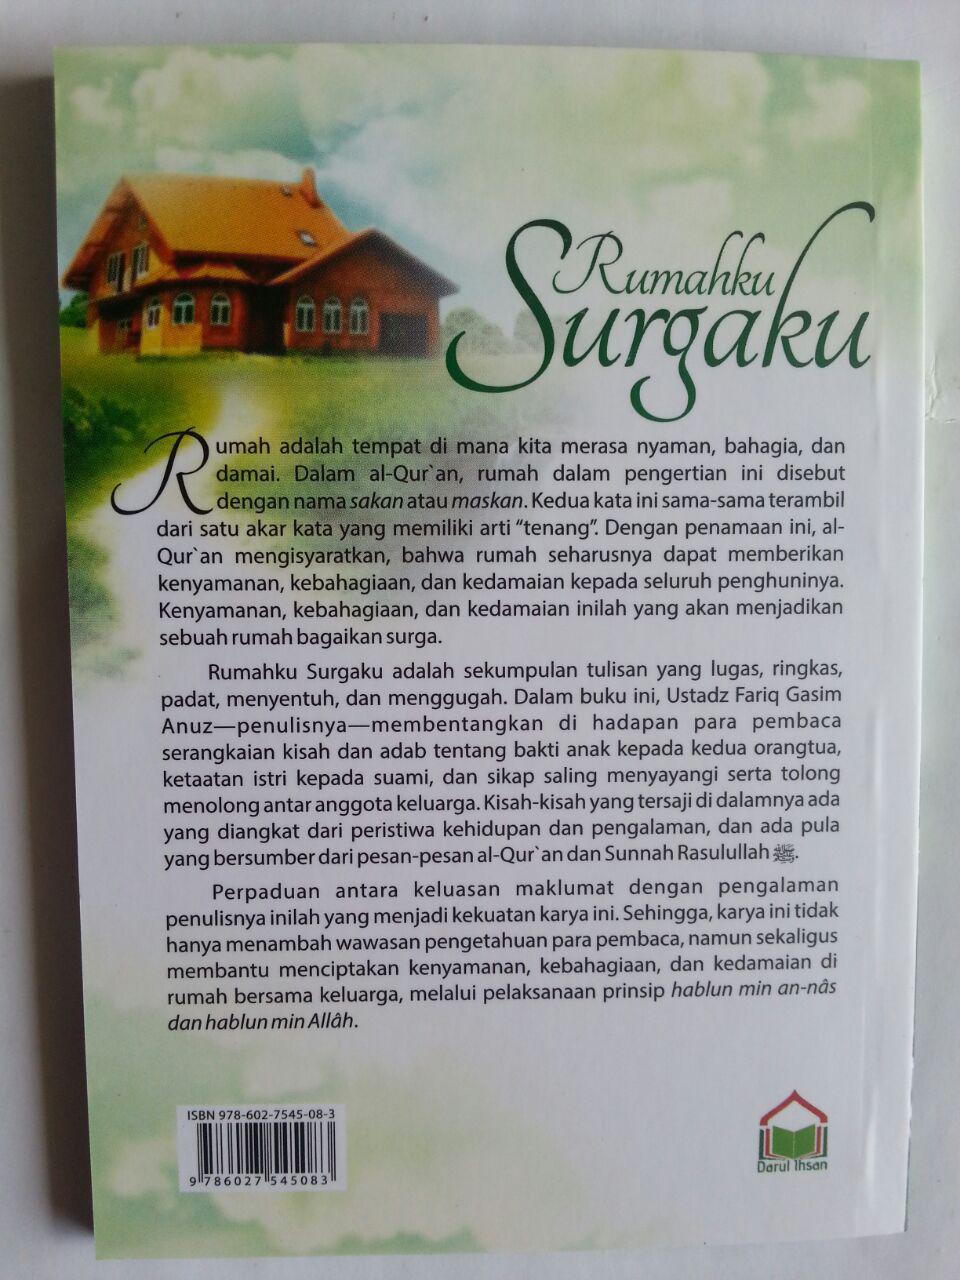 Buku Saku Rumahku Surgaku cover